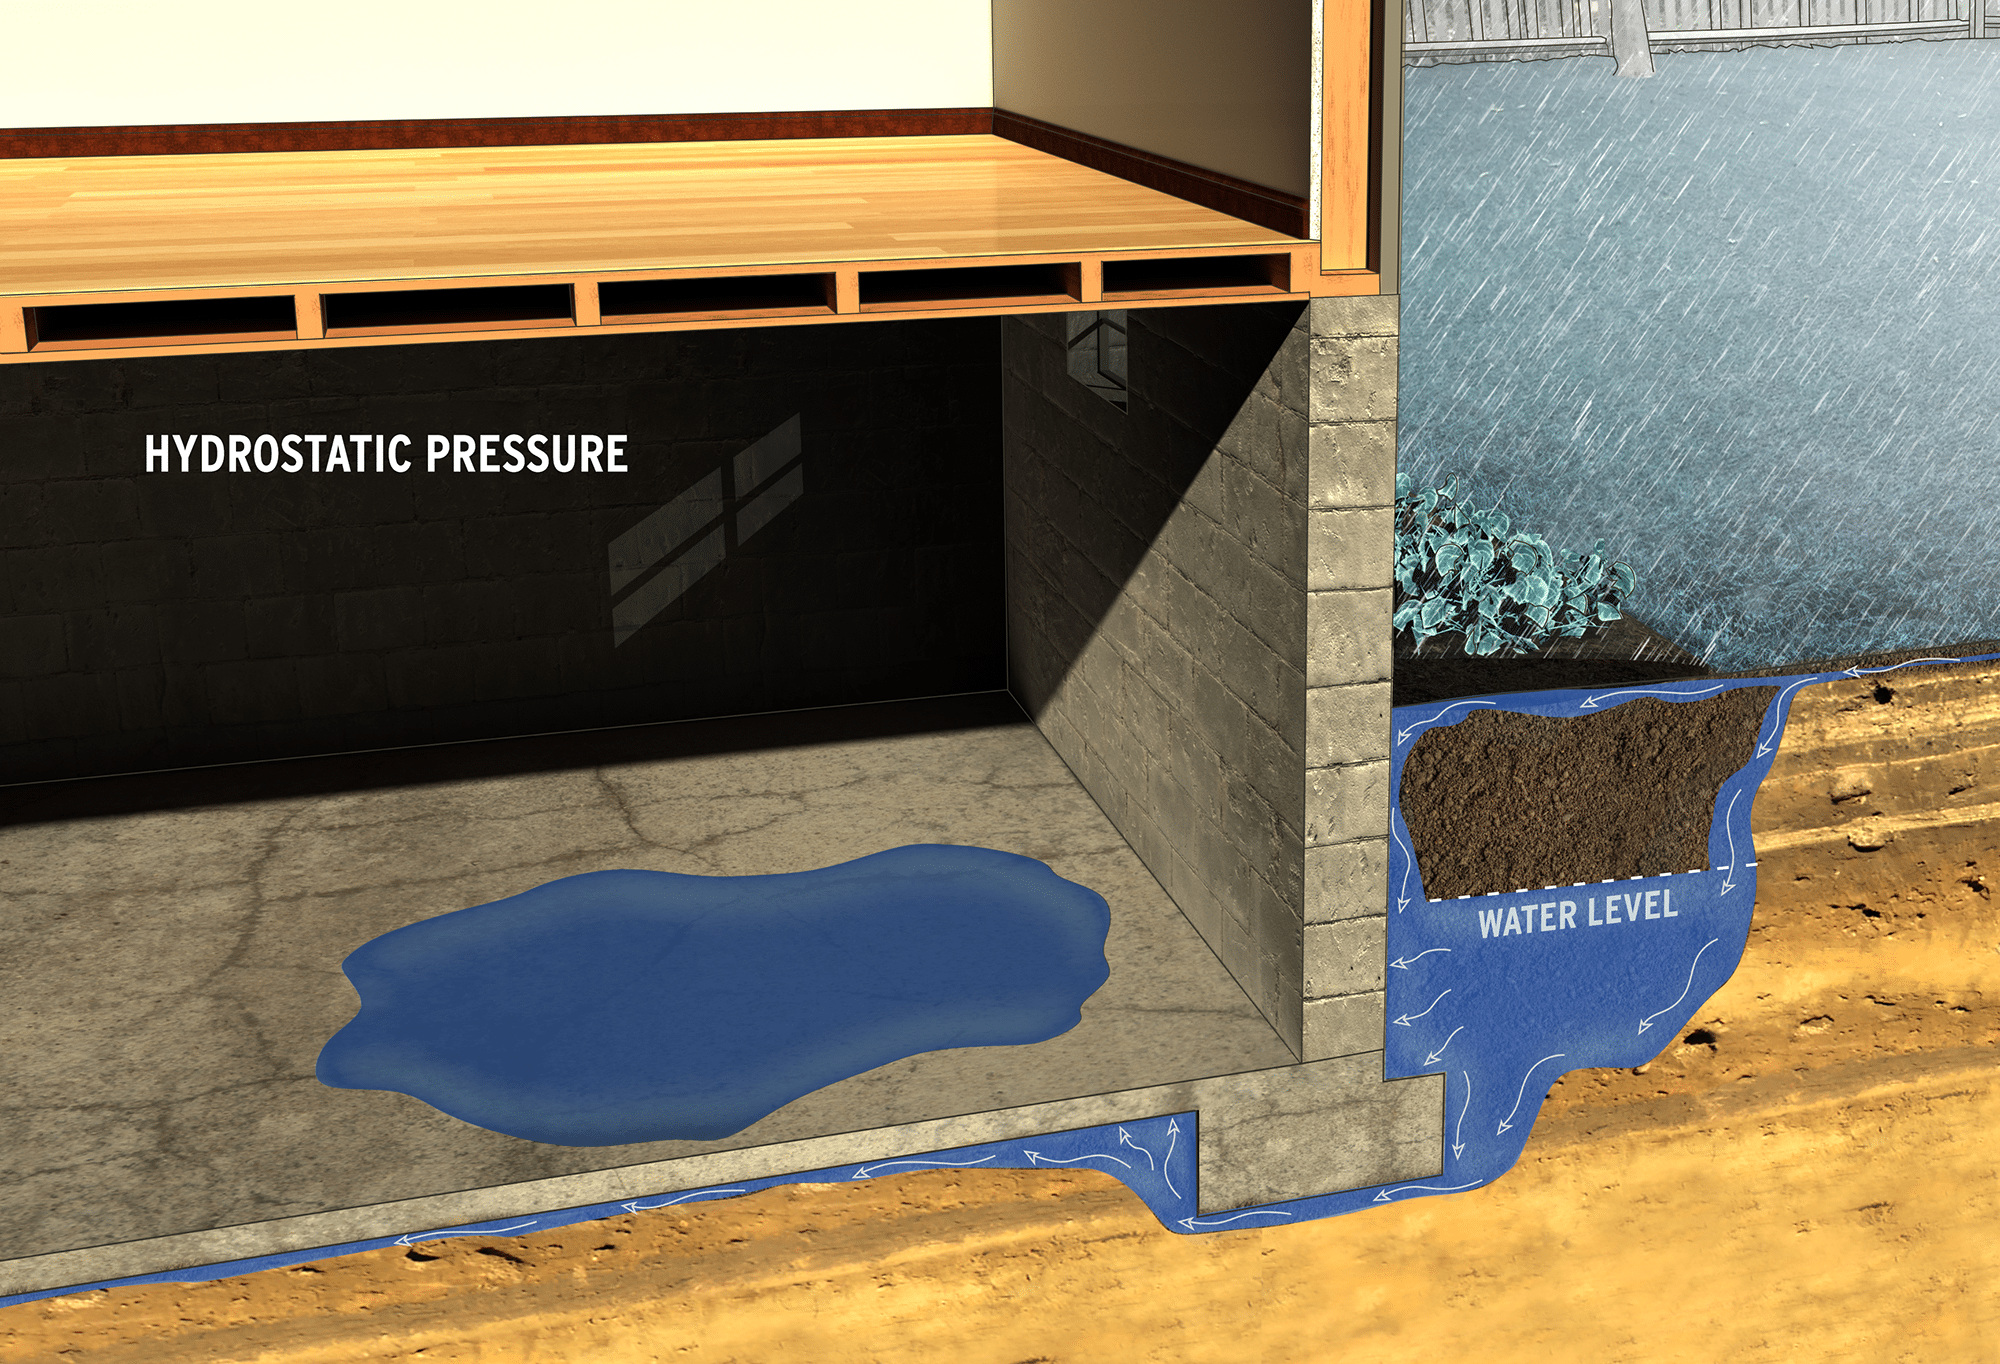 Hydrostatic Pressure Diagram